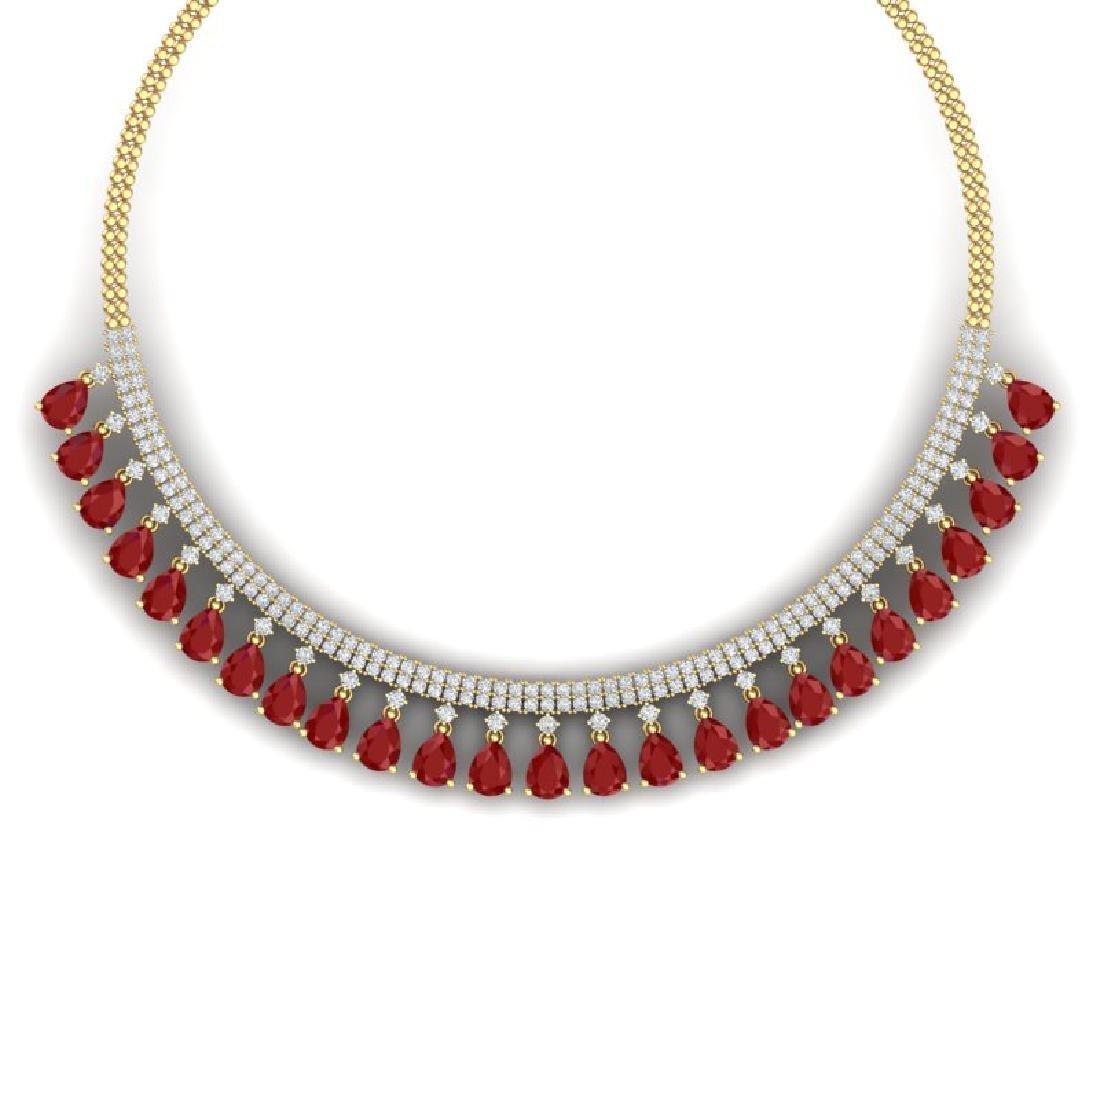 51.75 CTW Royalty Ruby & VS Diamond Necklace 18K Yellow